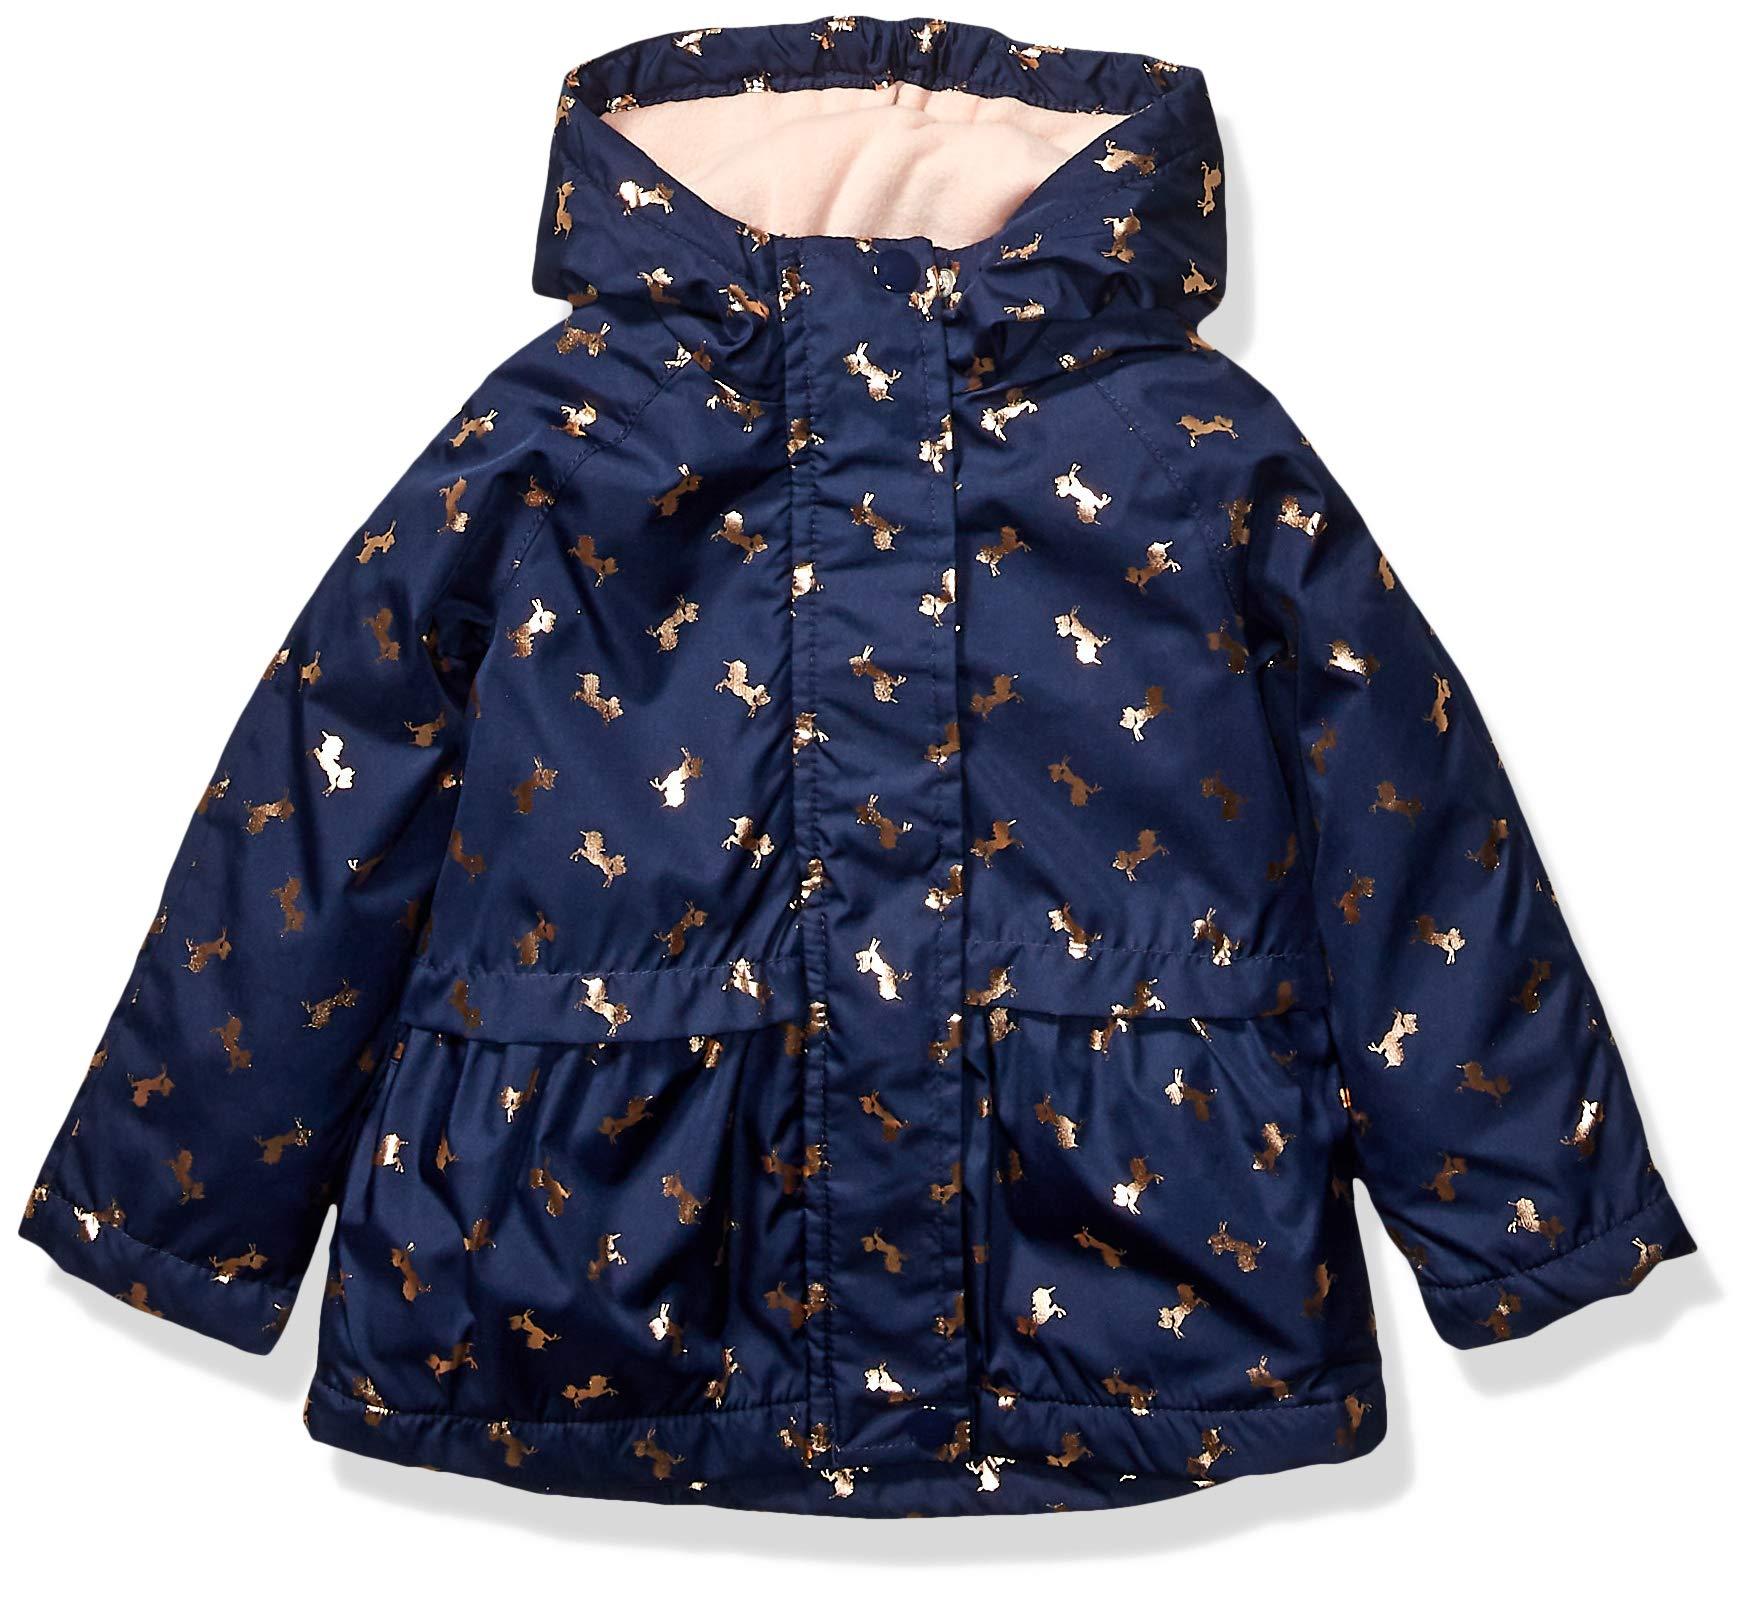 Osh Kosh Girls' Toddler Midweight Jacket with Fleece Lining, Gold Unicorns On Navy, 3T by OshKosh B'Gosh